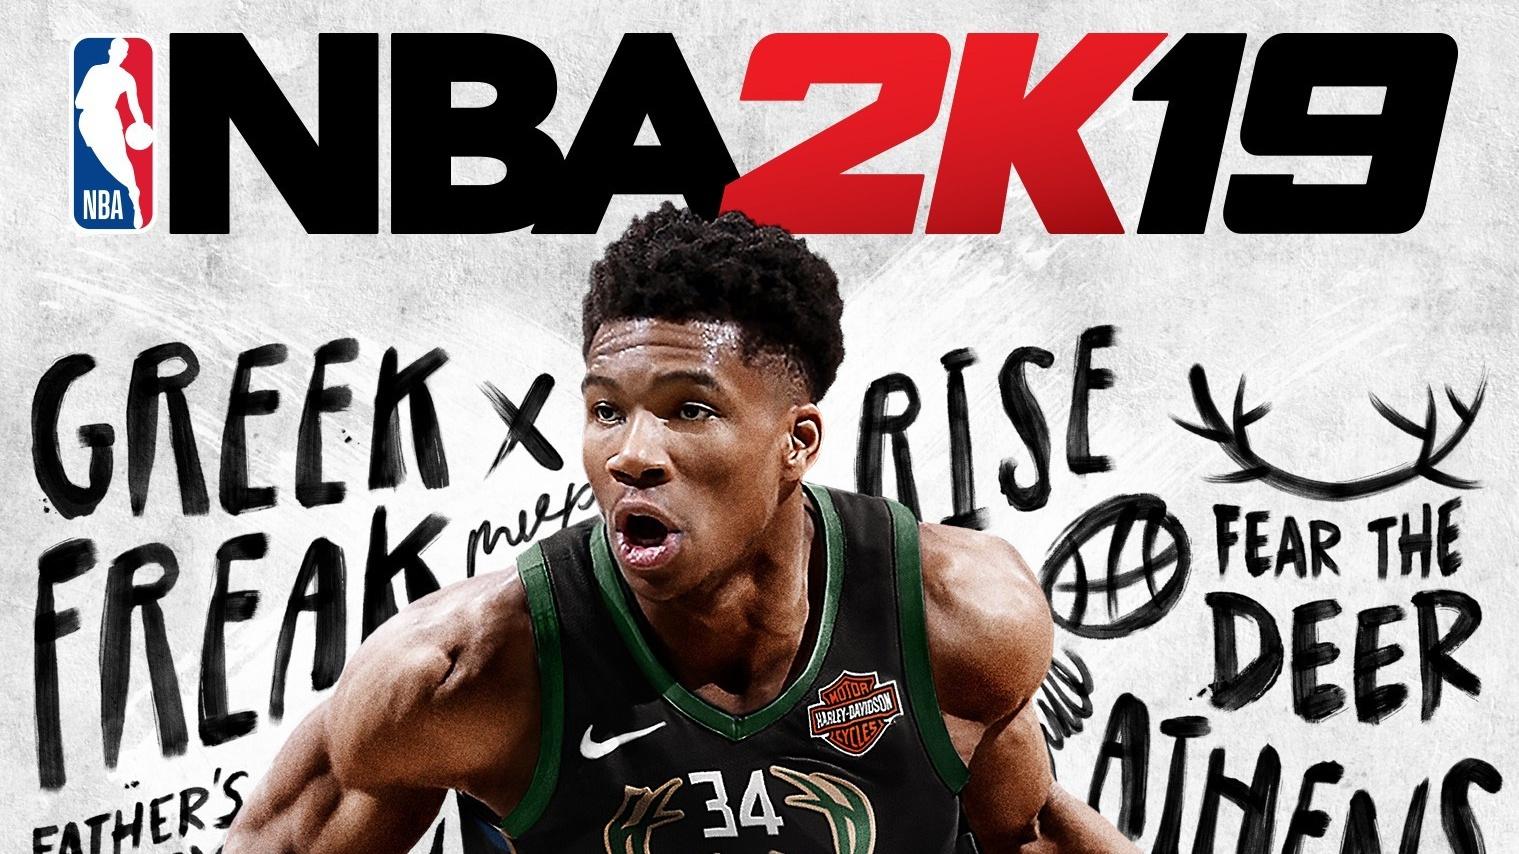 b nmqf - 本周XBOX游戏推荐:EA与2K的无声抗争